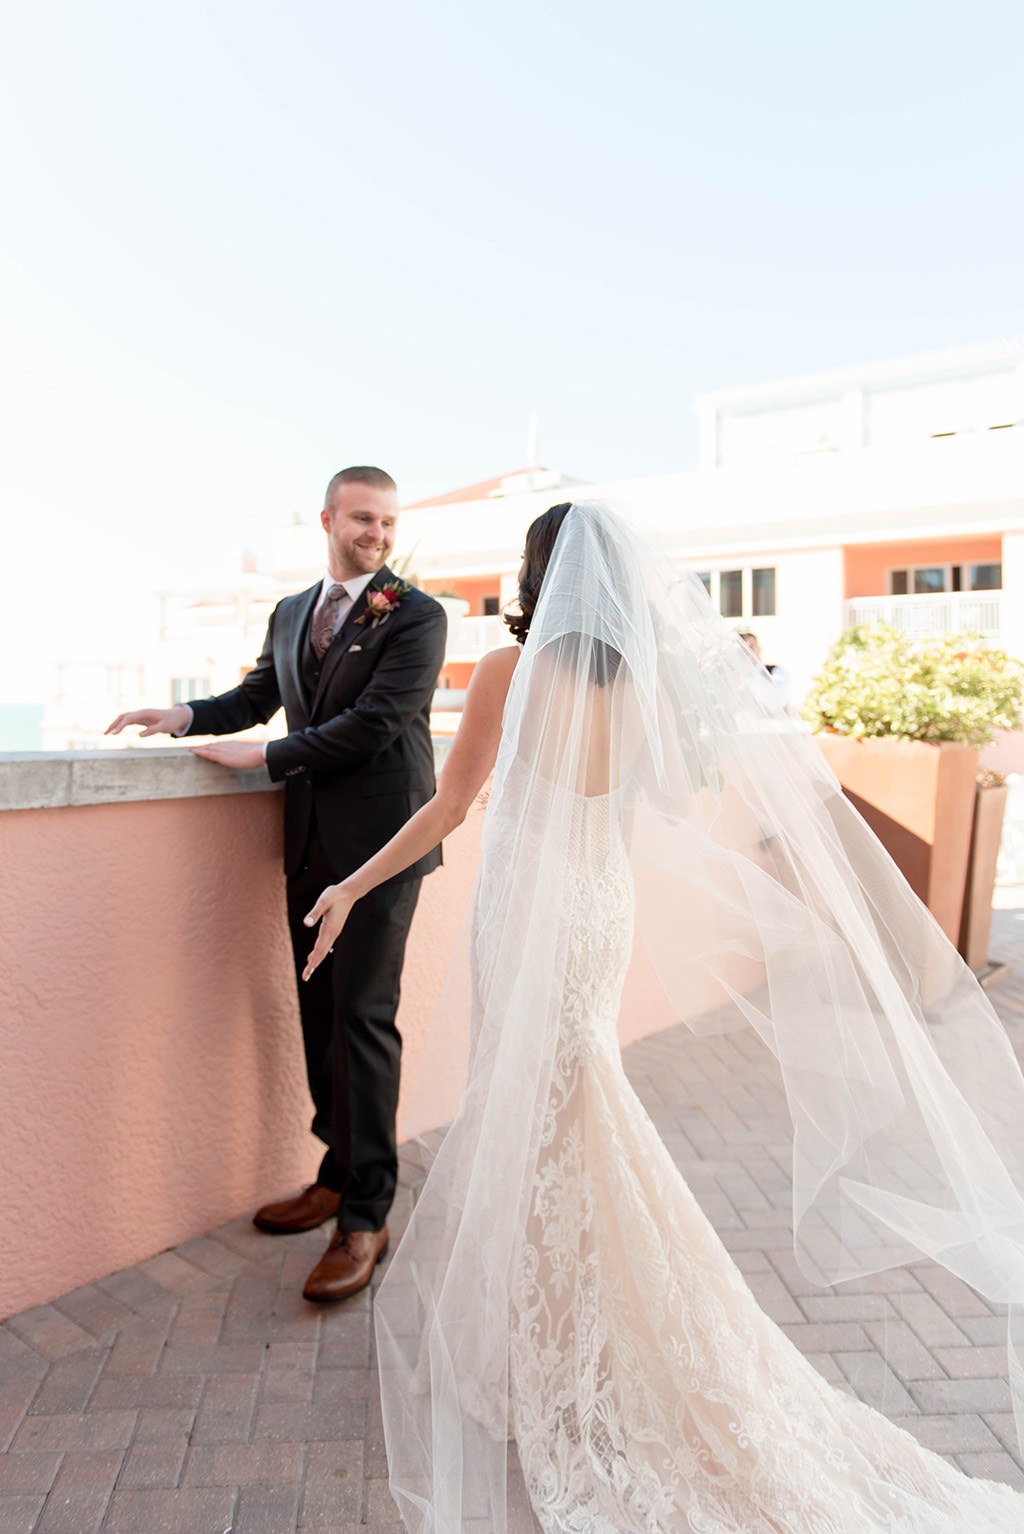 Florida Bride and Groom First Look Wedding Portrait on Waterfront Rooftop Hotel Wedding Venue Hyatt Regency Clearwater Beach | Tampa Bay Wedding Dress Shop Isabel O'Neil